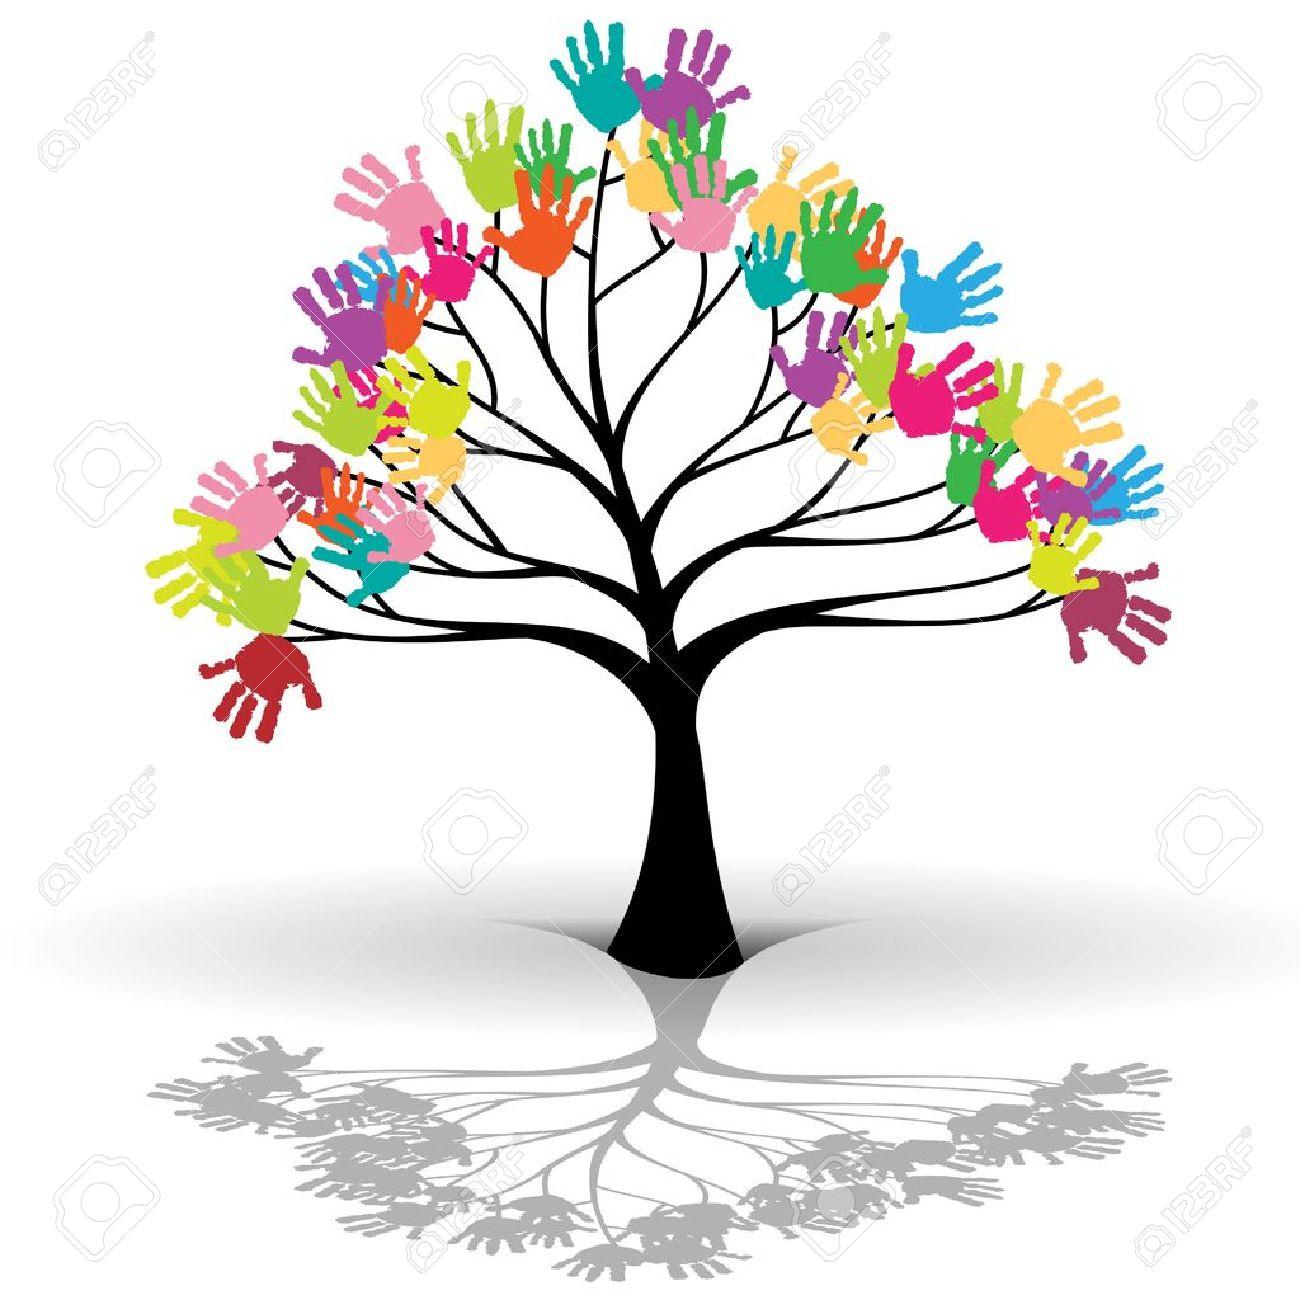 Kids tree - 16080330